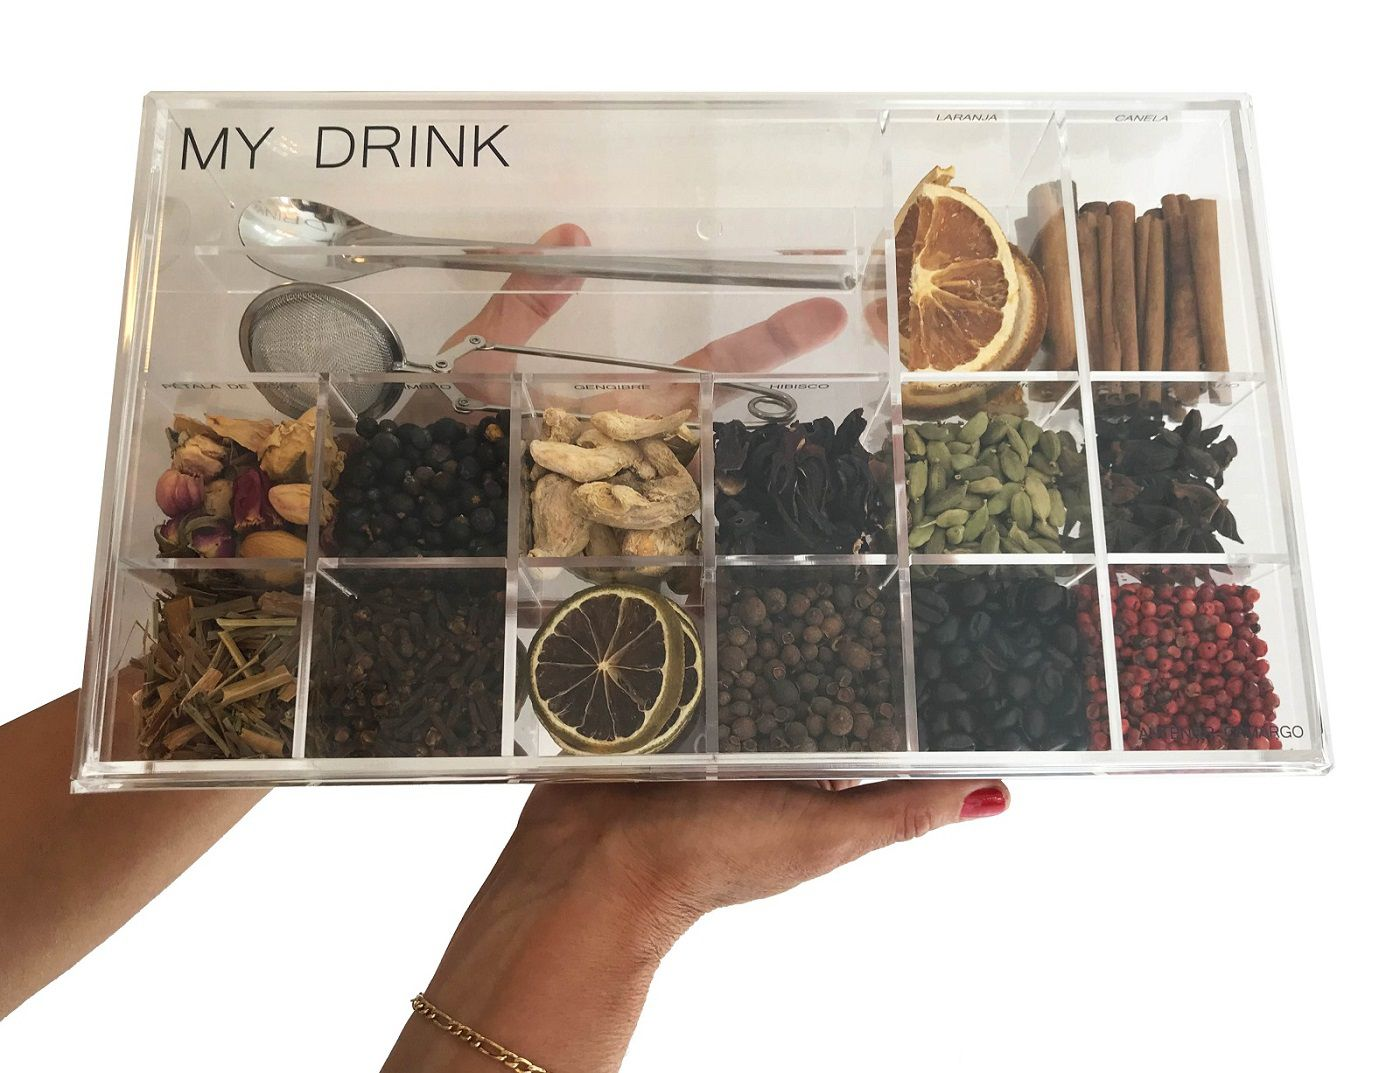 - INATIVO Caixa de Especiarias para Bebidas My Drinks Personalizada em Acrílico Grande